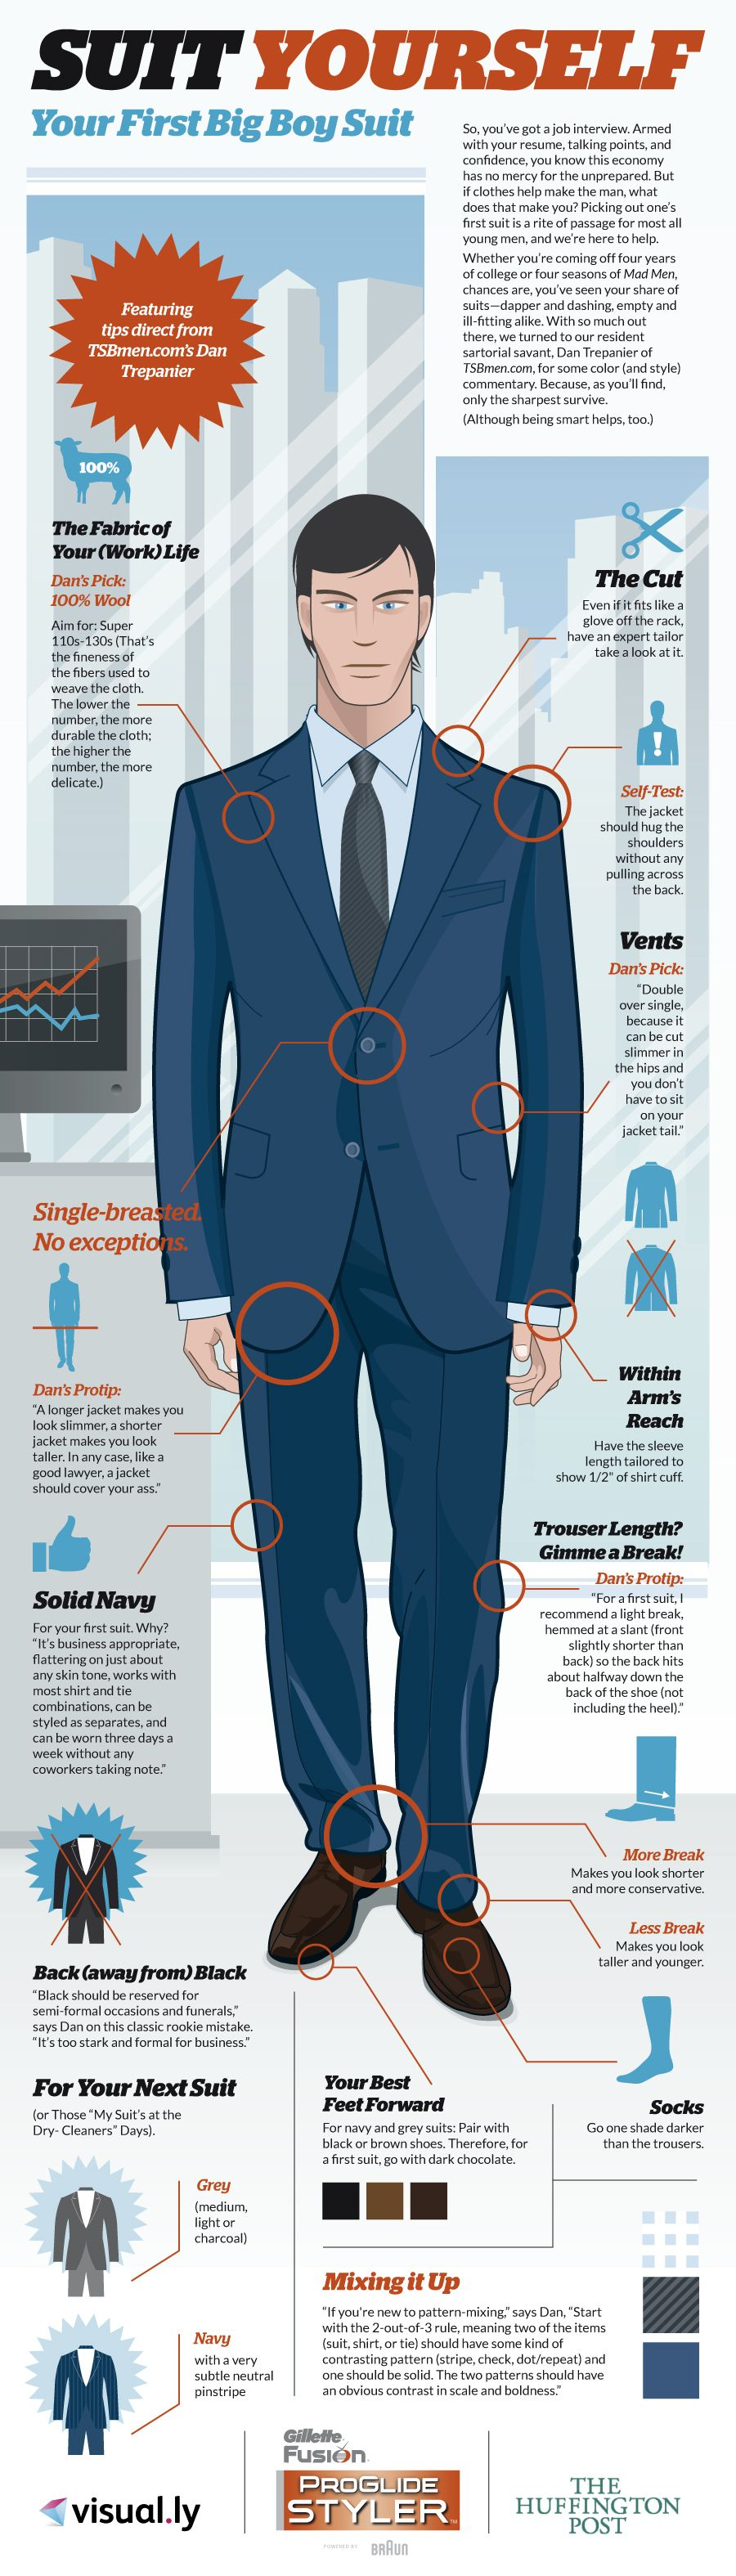 Black men dress for success images